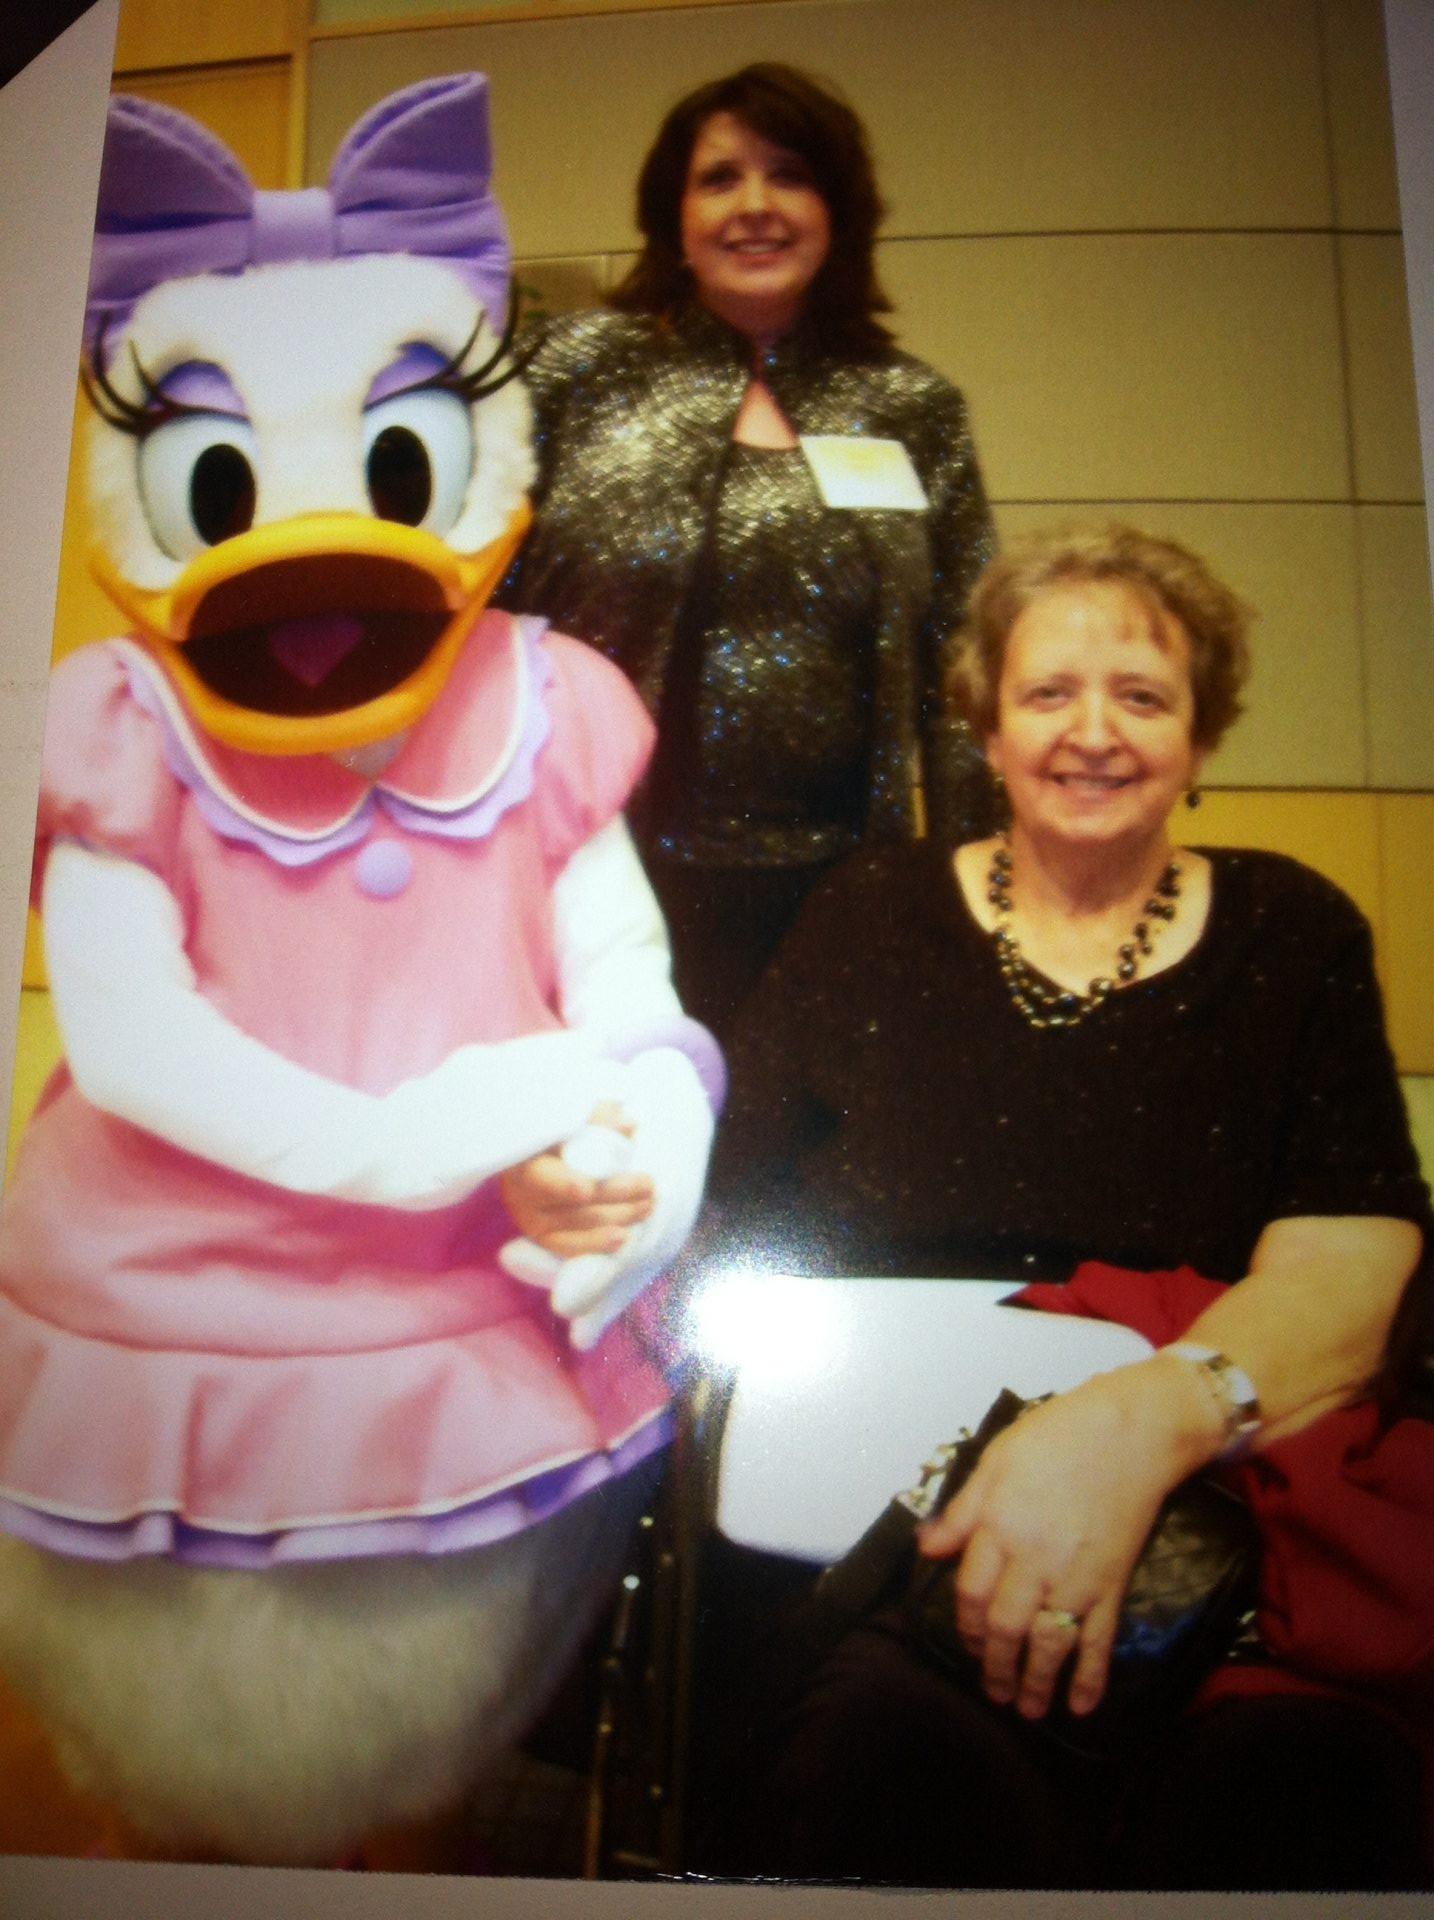 Celebrating Linda's 20 years at WDW